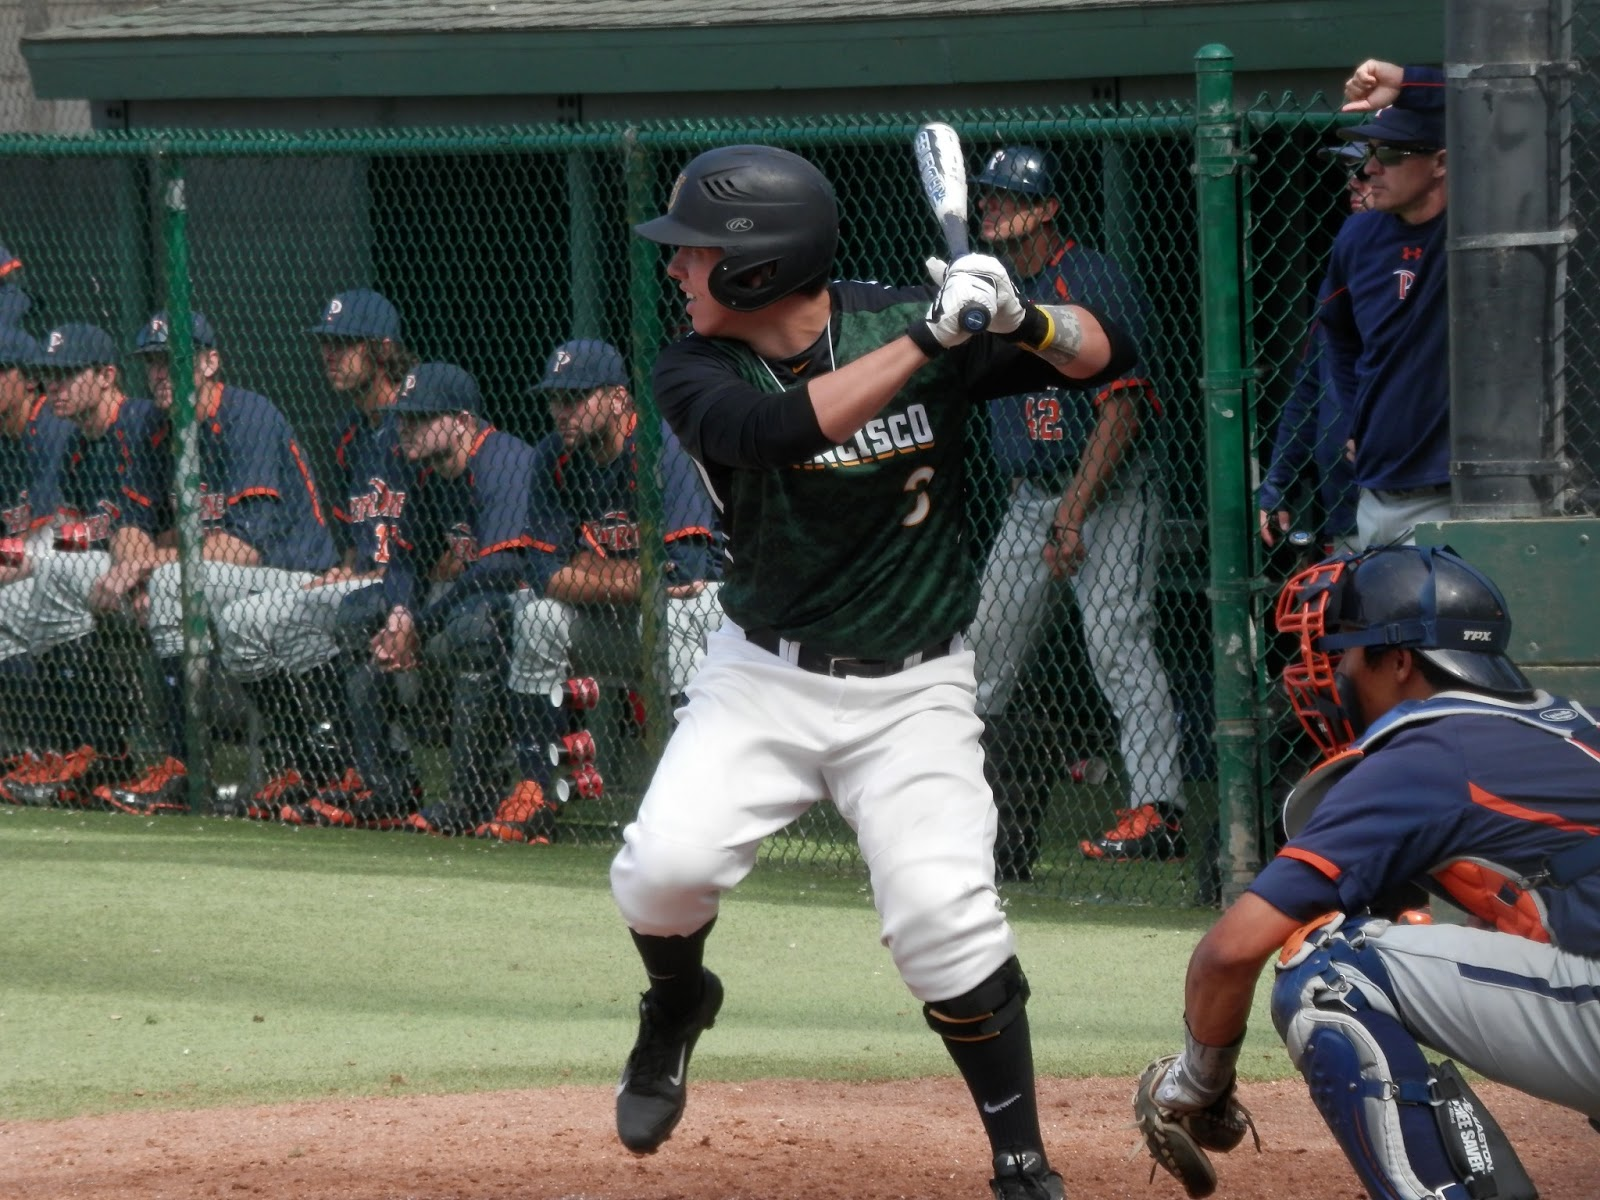 Bradley Zimmer Indians prospect swing